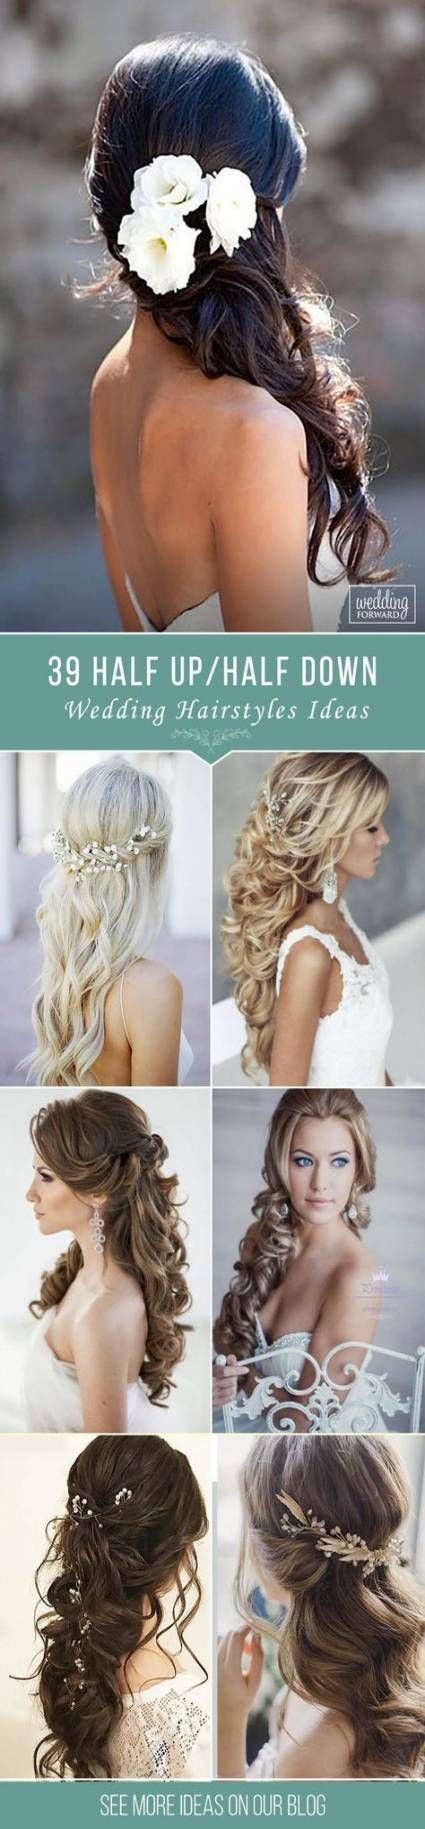 Wedding hairstyles elegant updo up dos 48+ Ideas